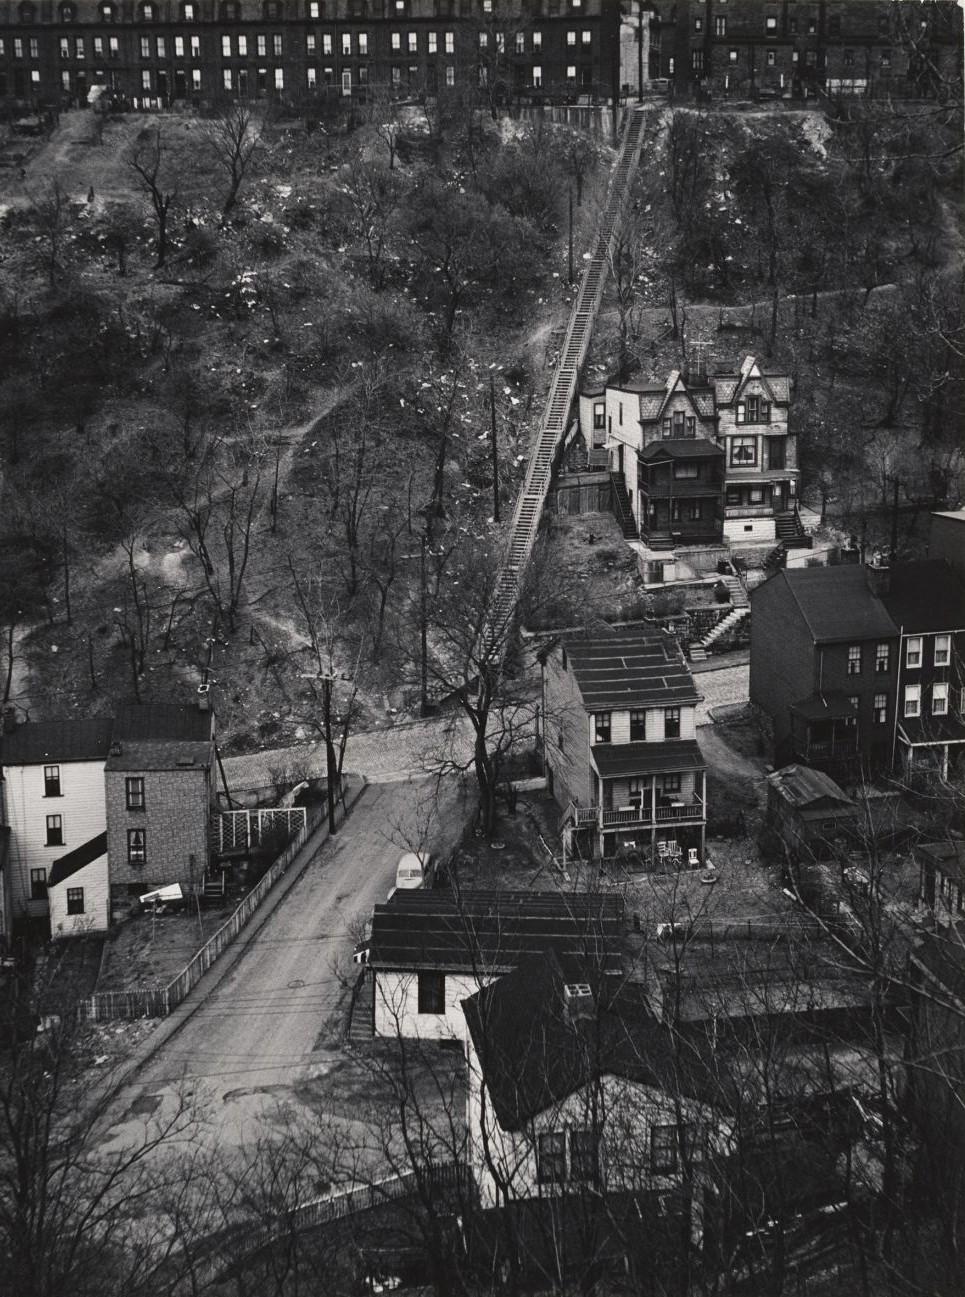 City Housing, 1955